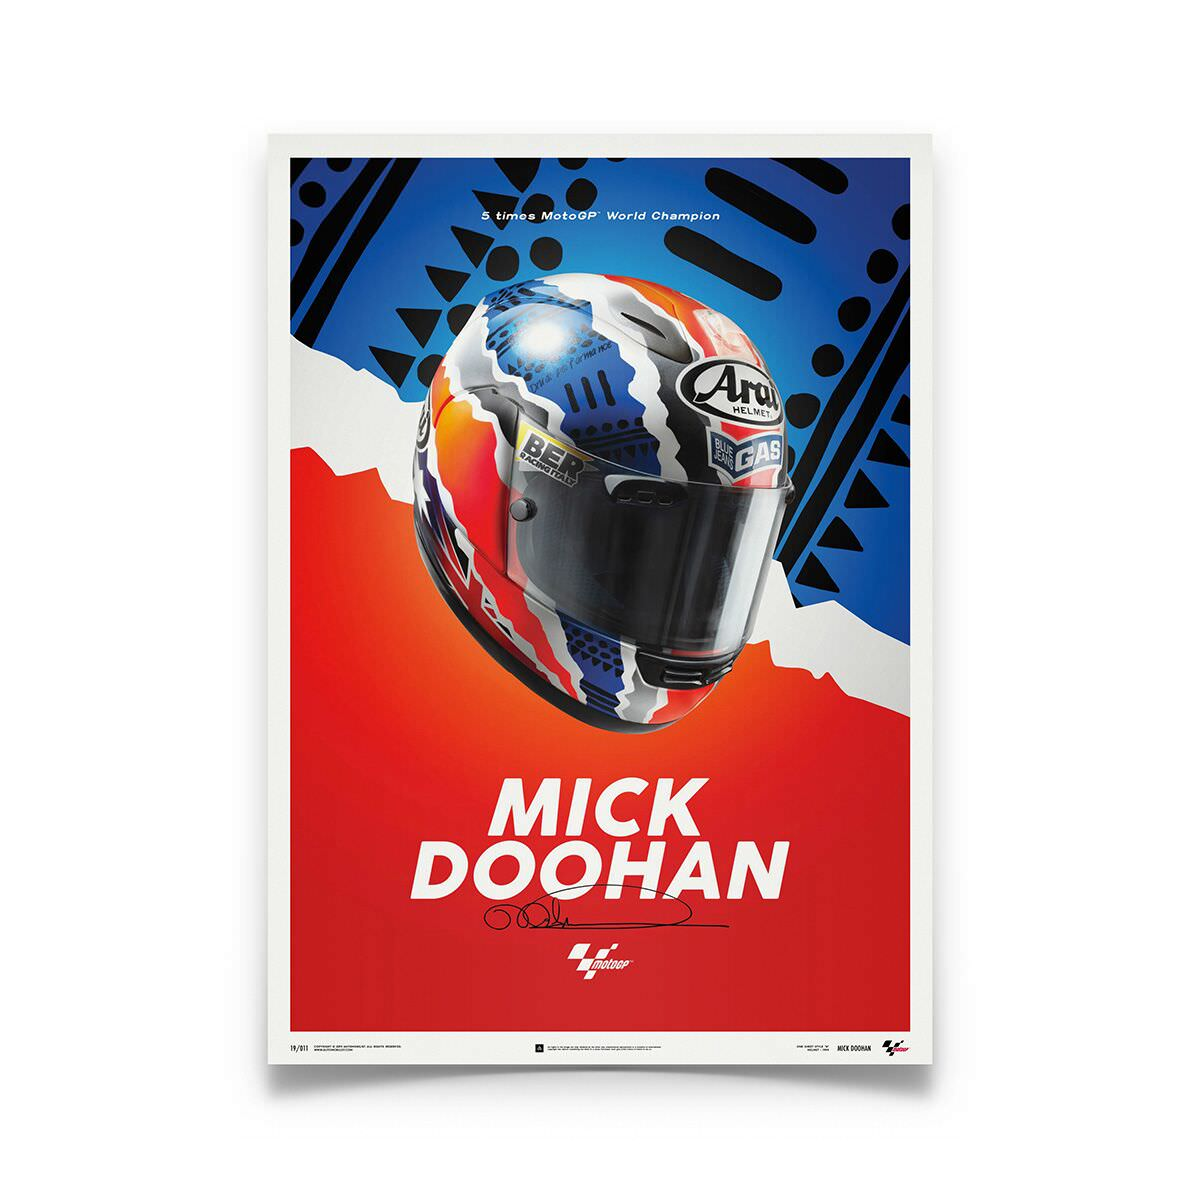 Product image for Mick Doohan Helmet 1999 Poster